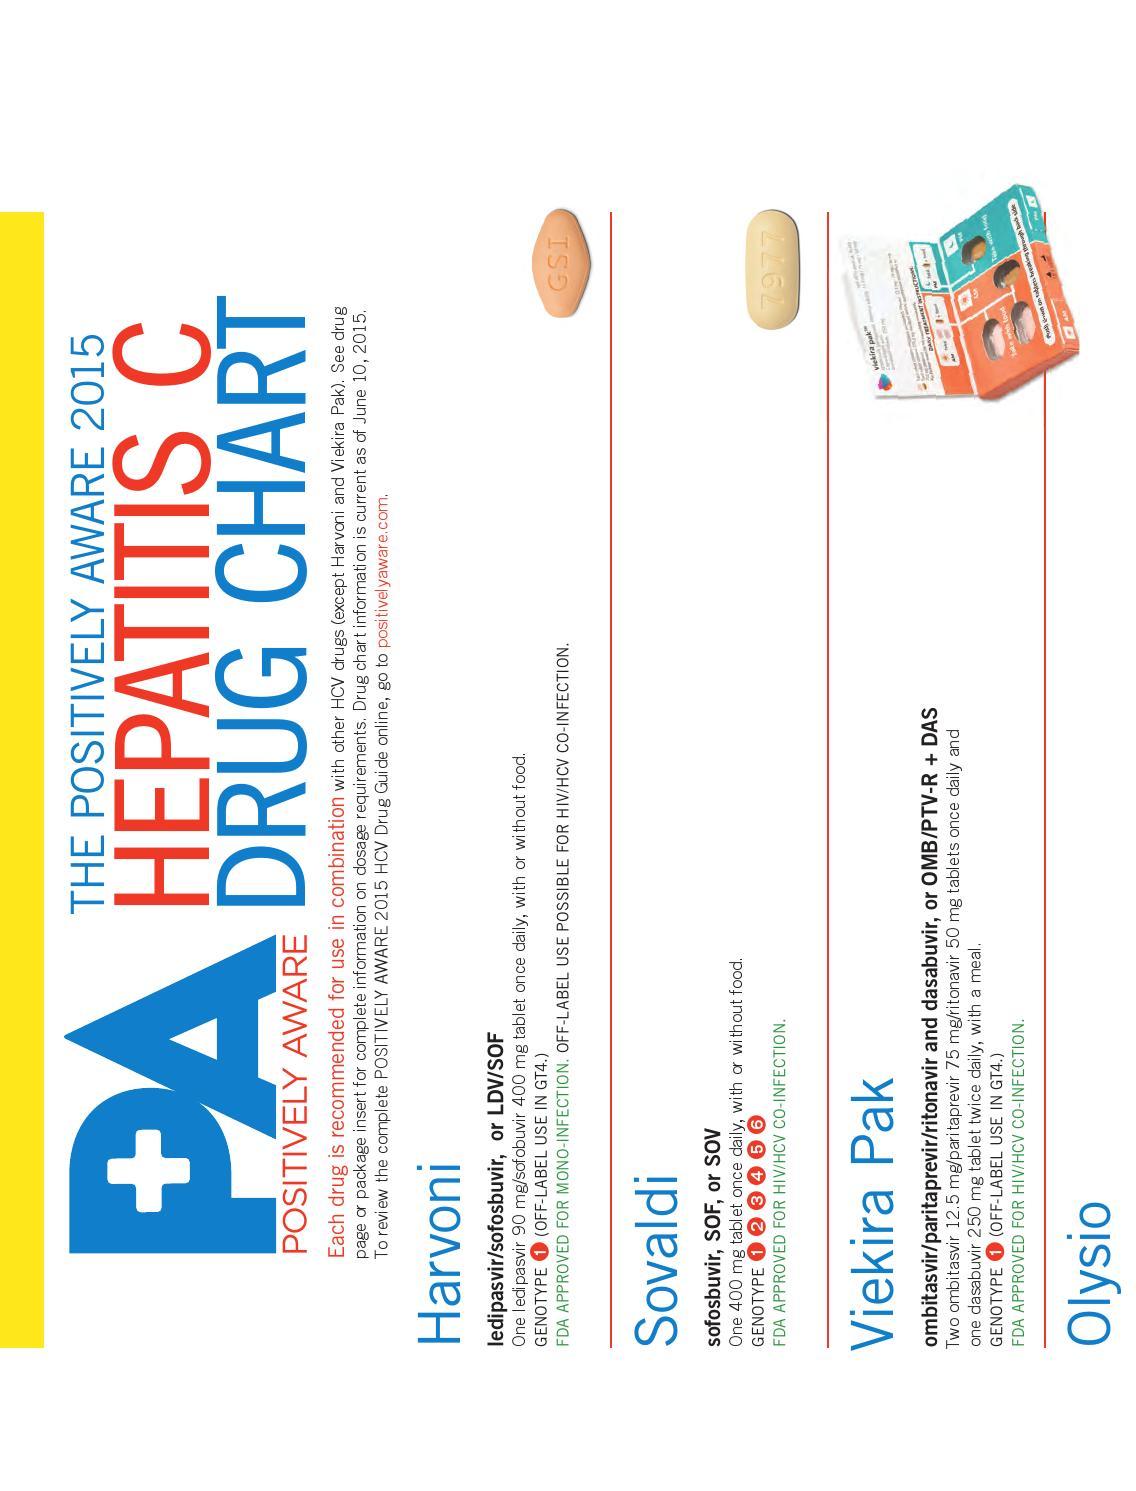 2015 drug id guide (online version) streetdrugs. Org.